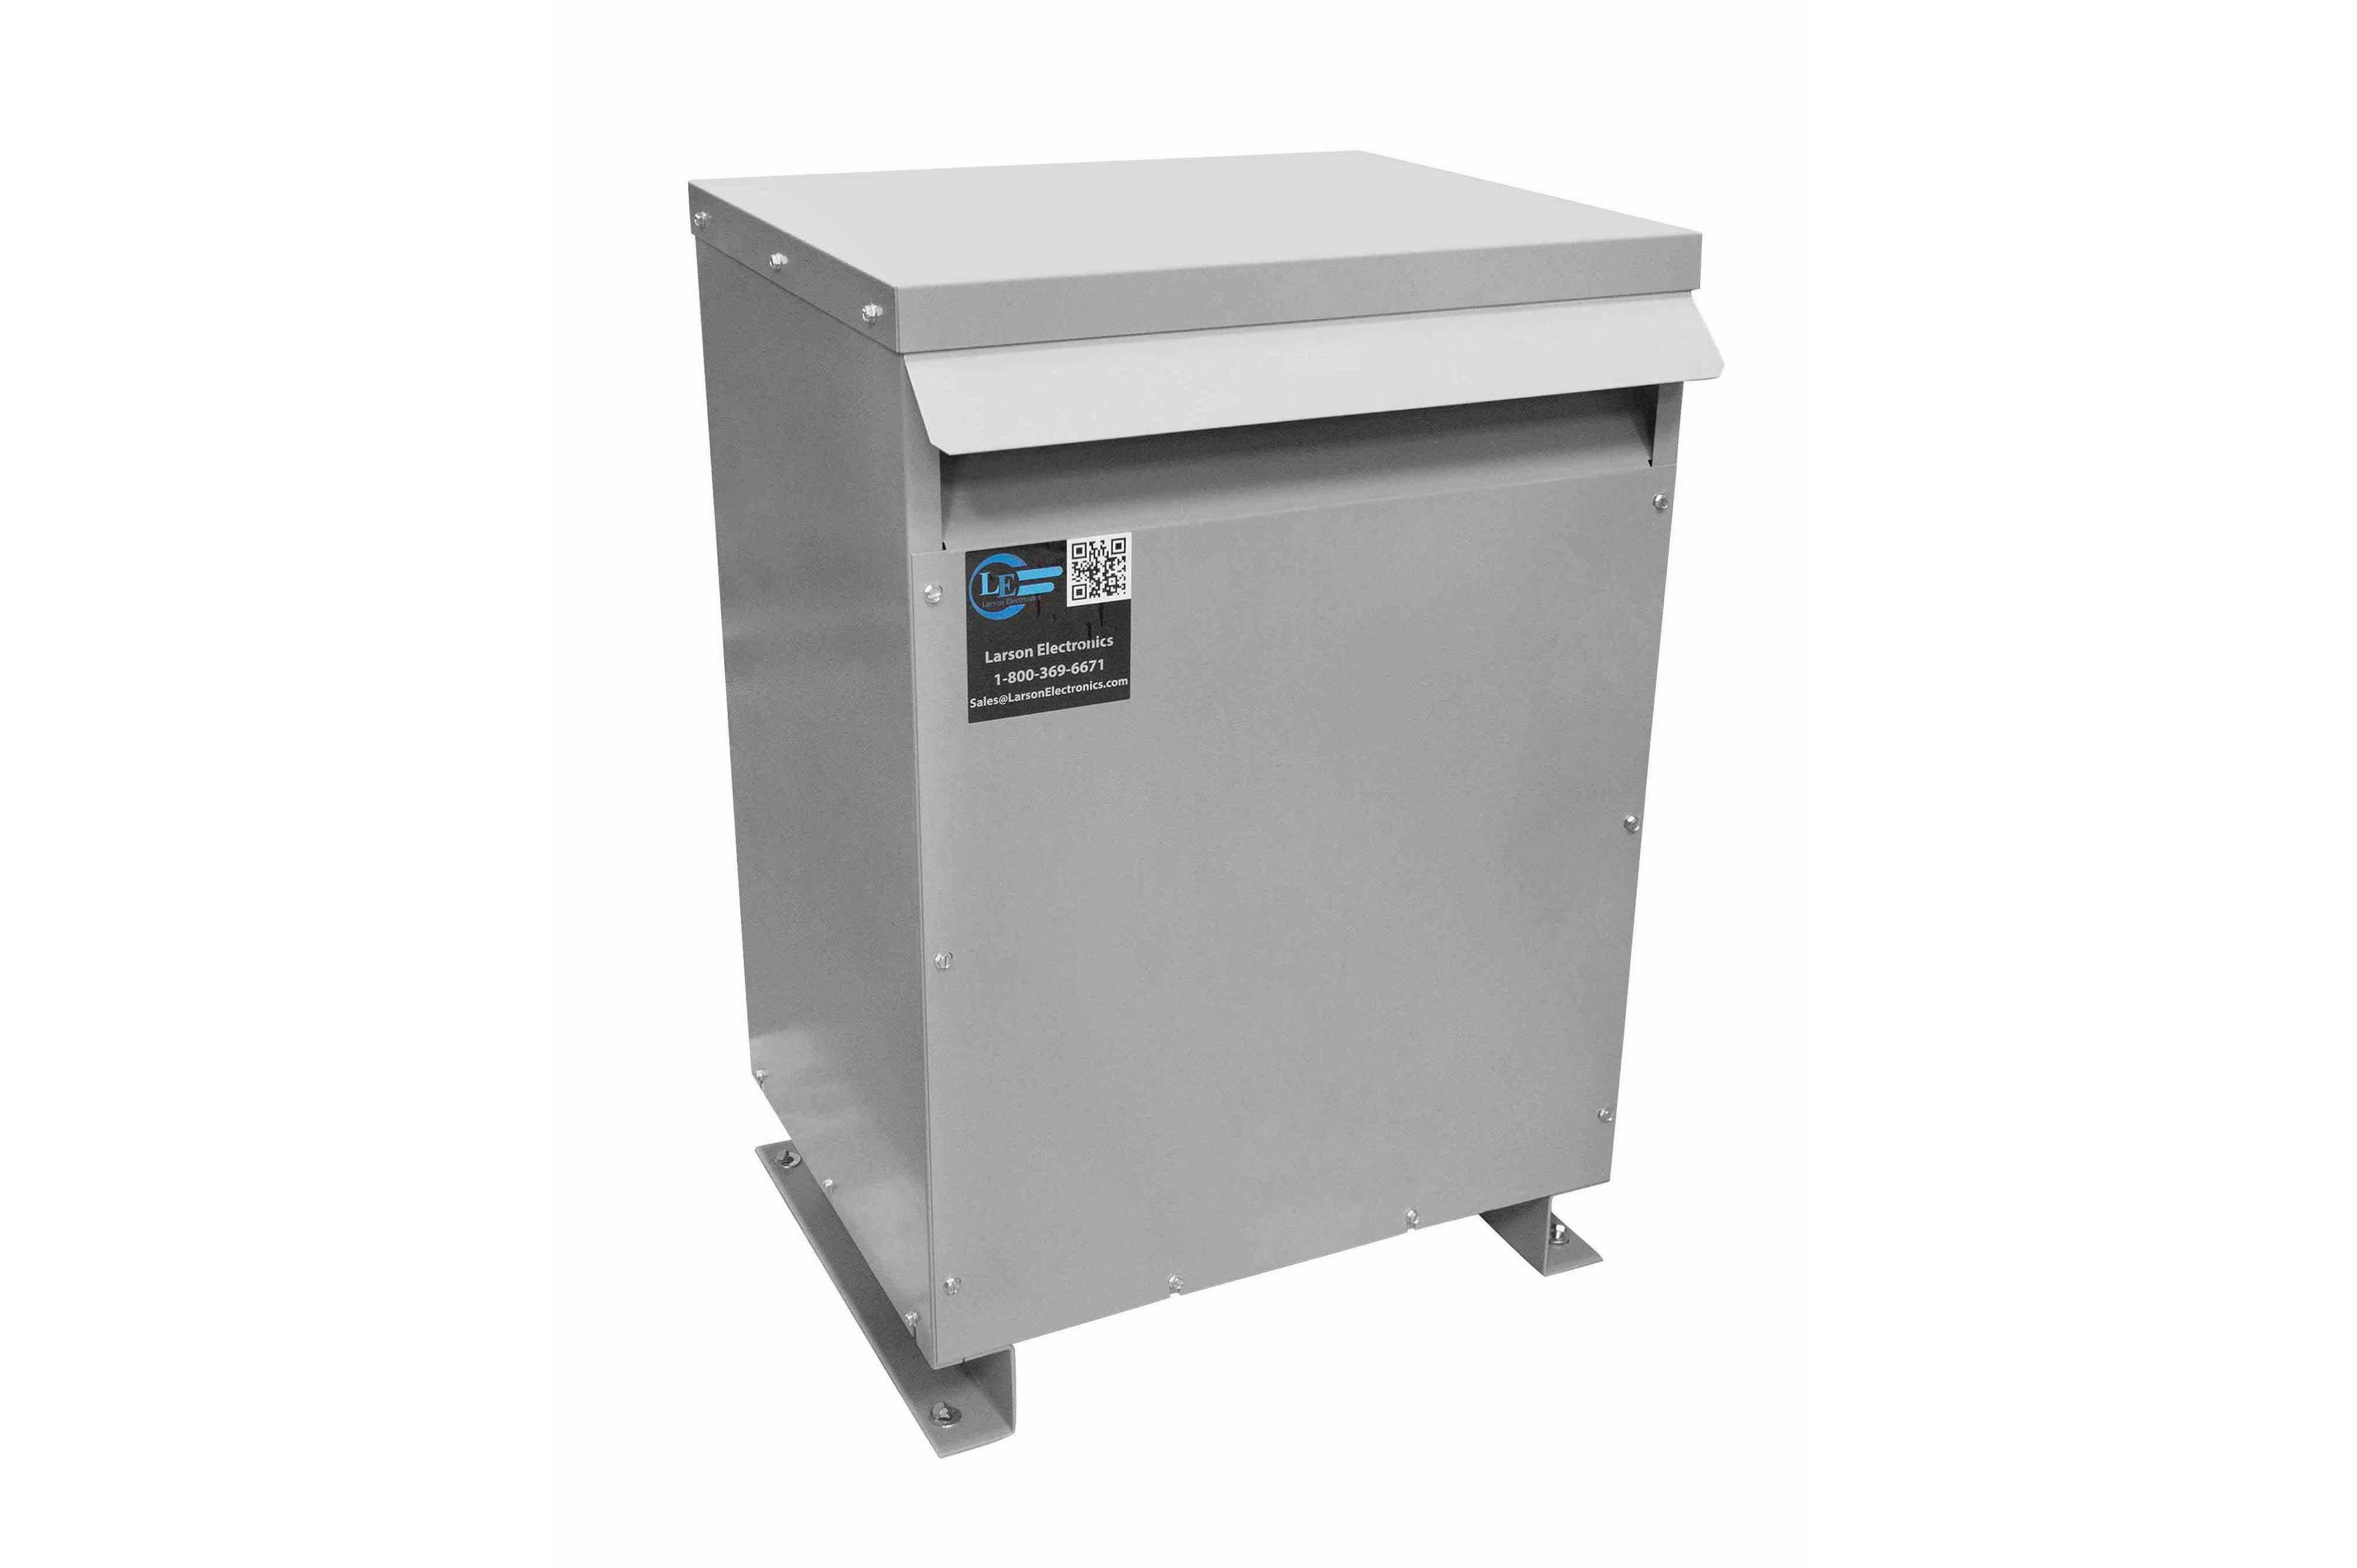 75 kVA 3PH Isolation Transformer, 240V Wye Primary, 380V Delta Secondary, N3R, Ventilated, 60 Hz